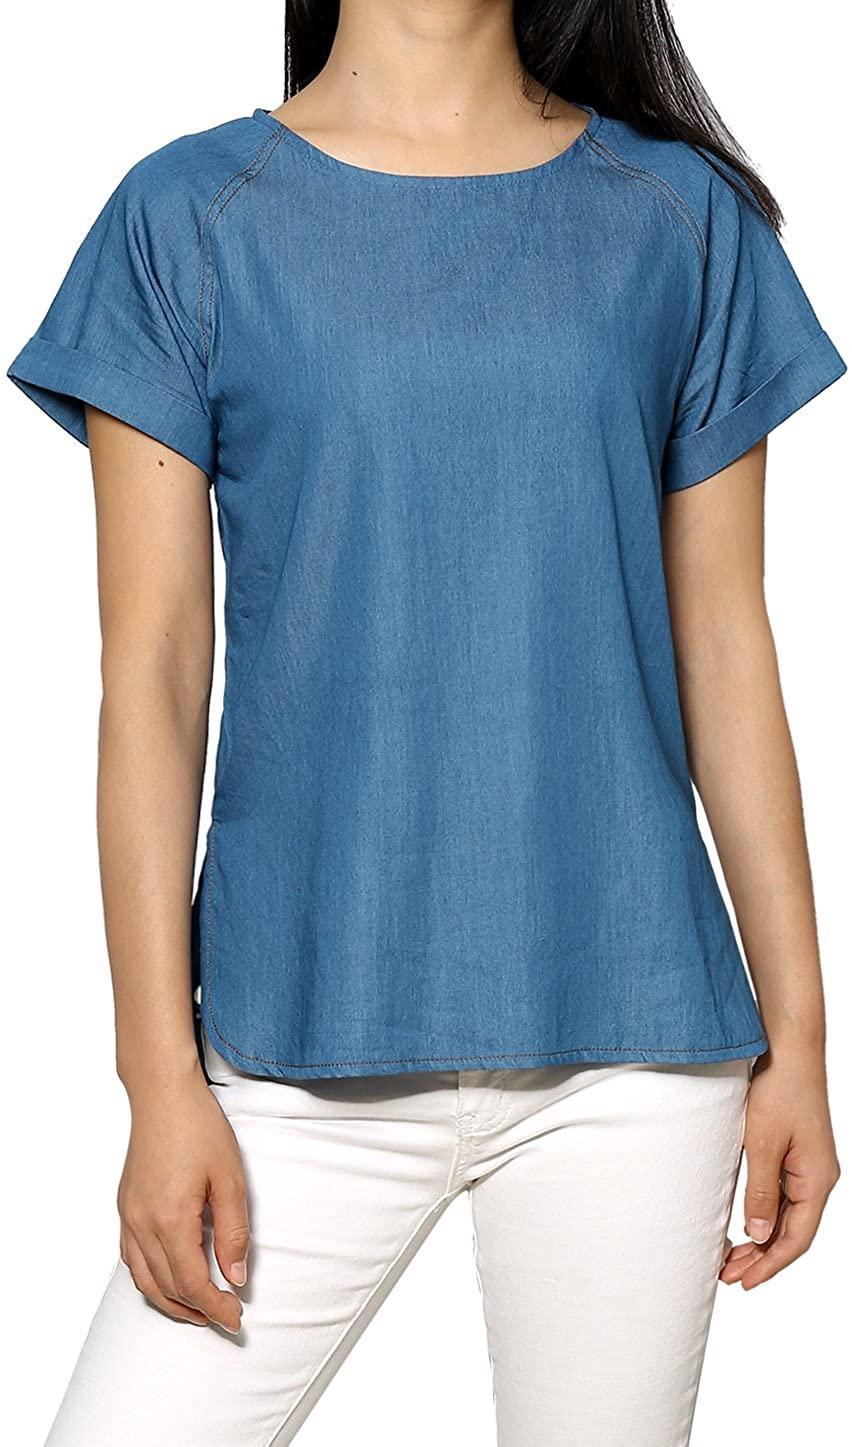 Allegra K Women's Cuffed Raglan Sleeves Side Slit Chambray Top